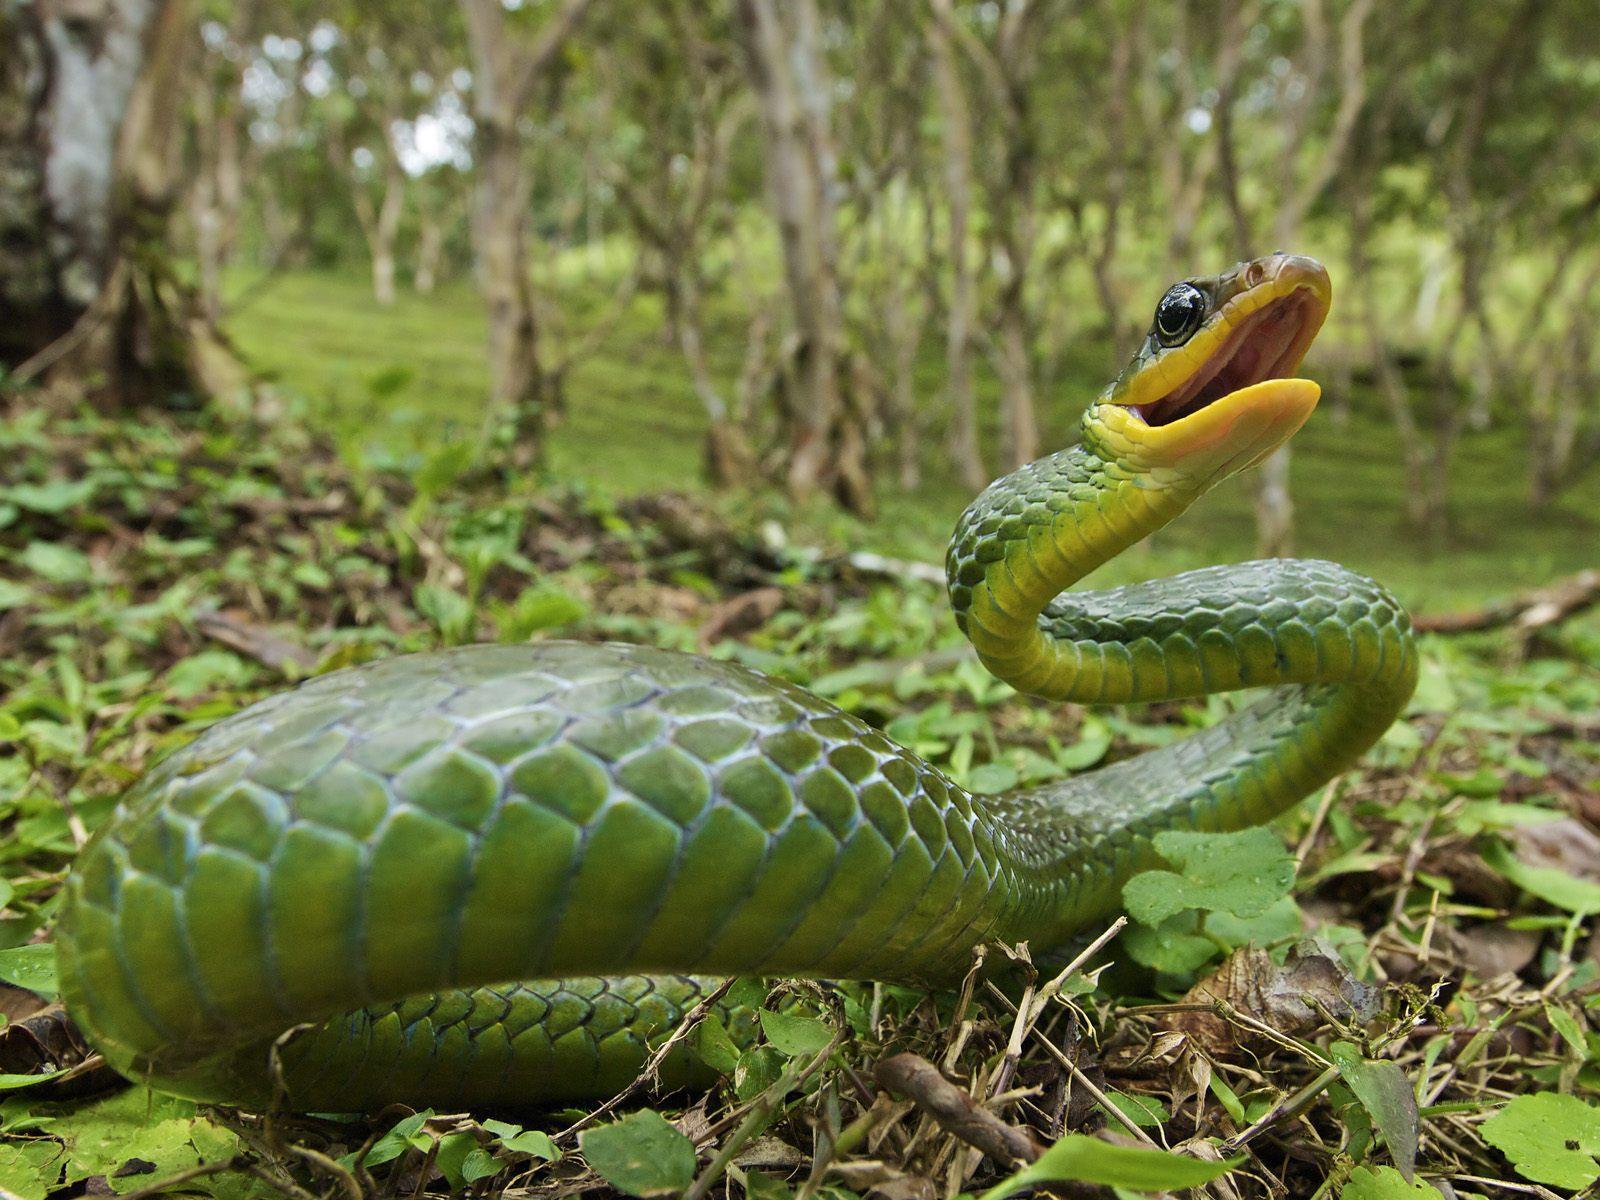 venomous snakes wallpaper viper pictures snake dowload viper snake 1600x1200